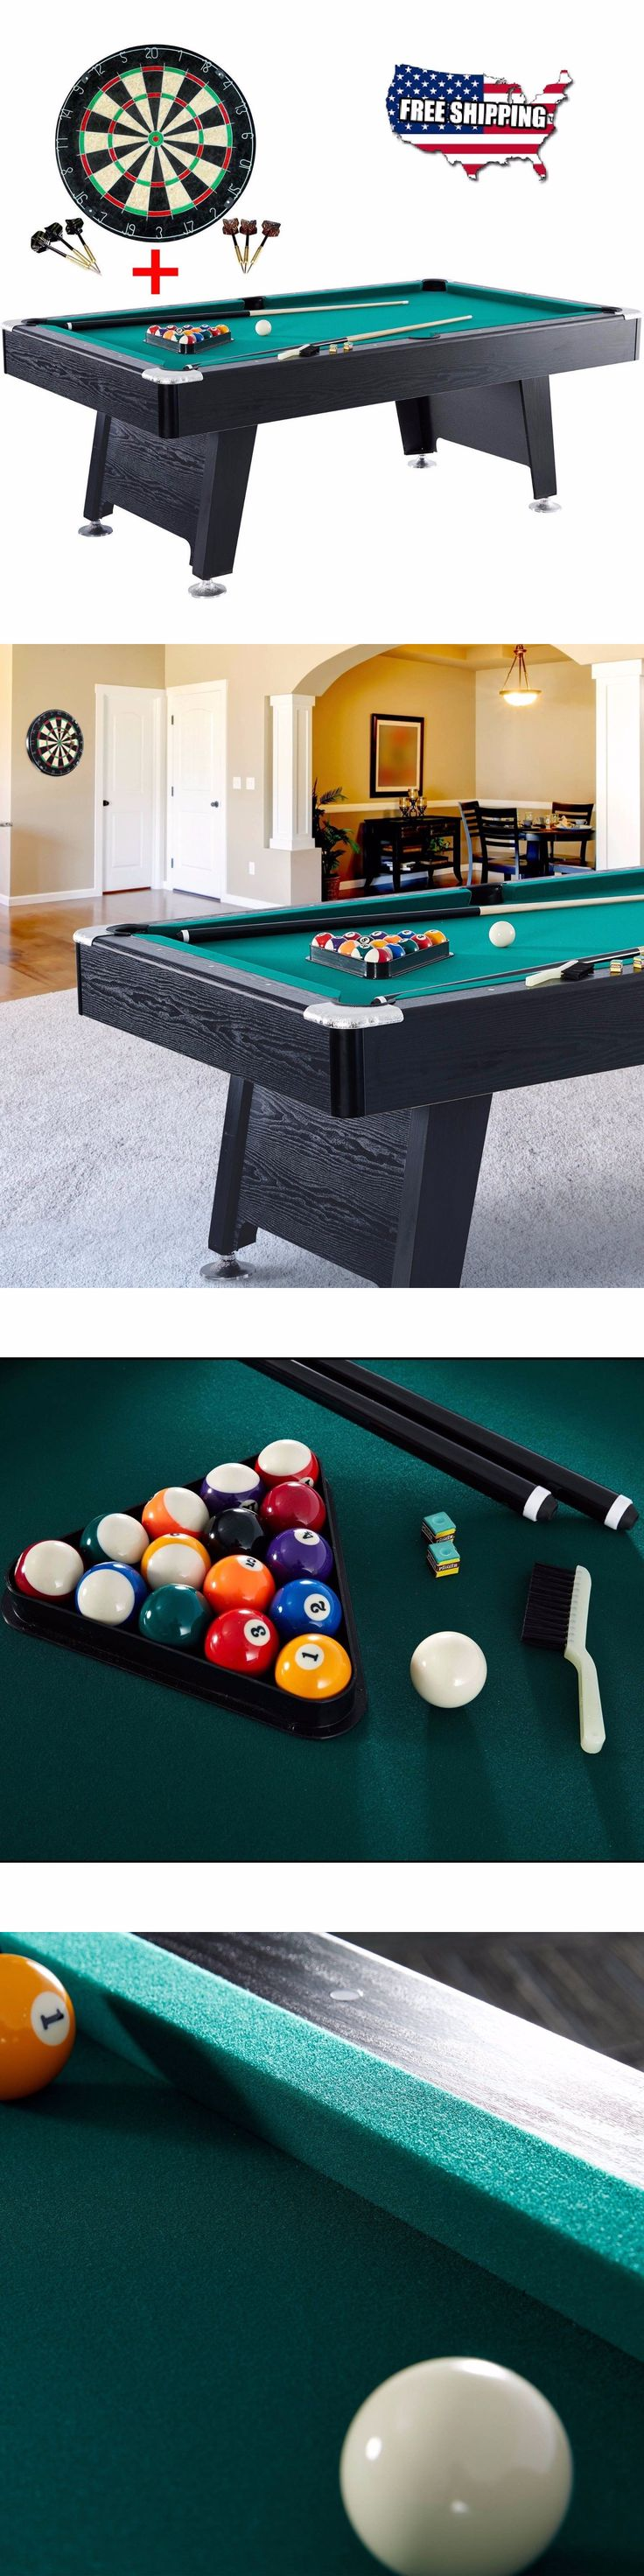 Unique pool tables family room contemporary with bold pool table cool - Tables 21213 84 Inch Pool Table Game Room Billiard Balls Cues Table With Bonus